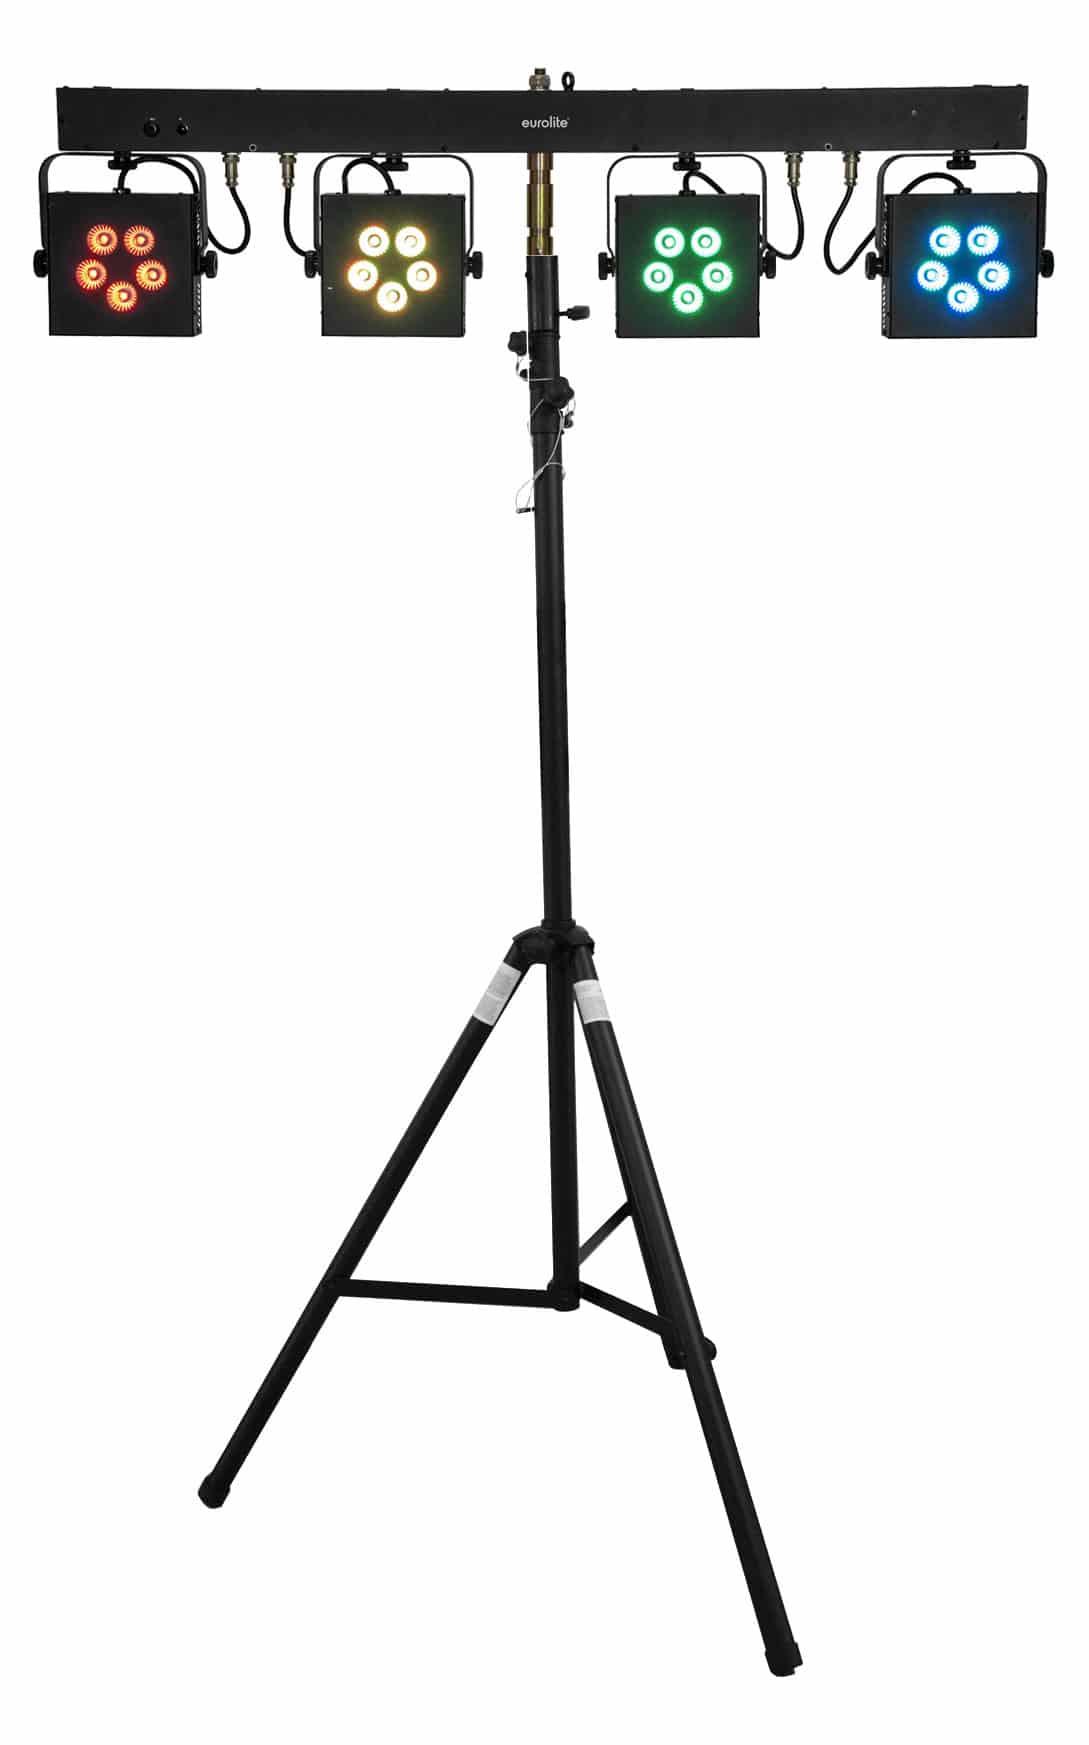 Lichtsets - Eurolite LED KLS 902 Next Kompakt Lichtset inkl. Stativ - Onlineshop Musikhaus Kirstein